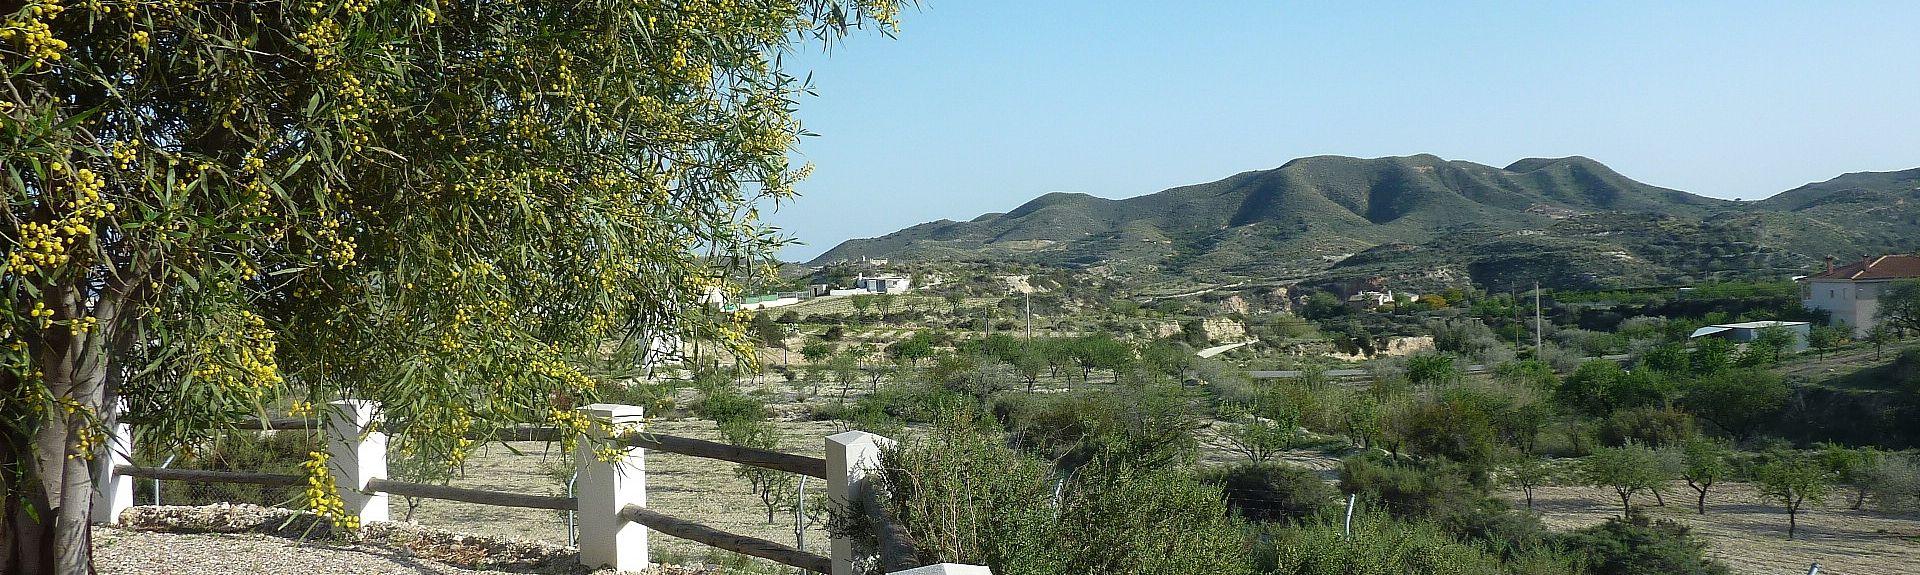 Valle del Este Golf Club, Vera, Andalusien, Spanien